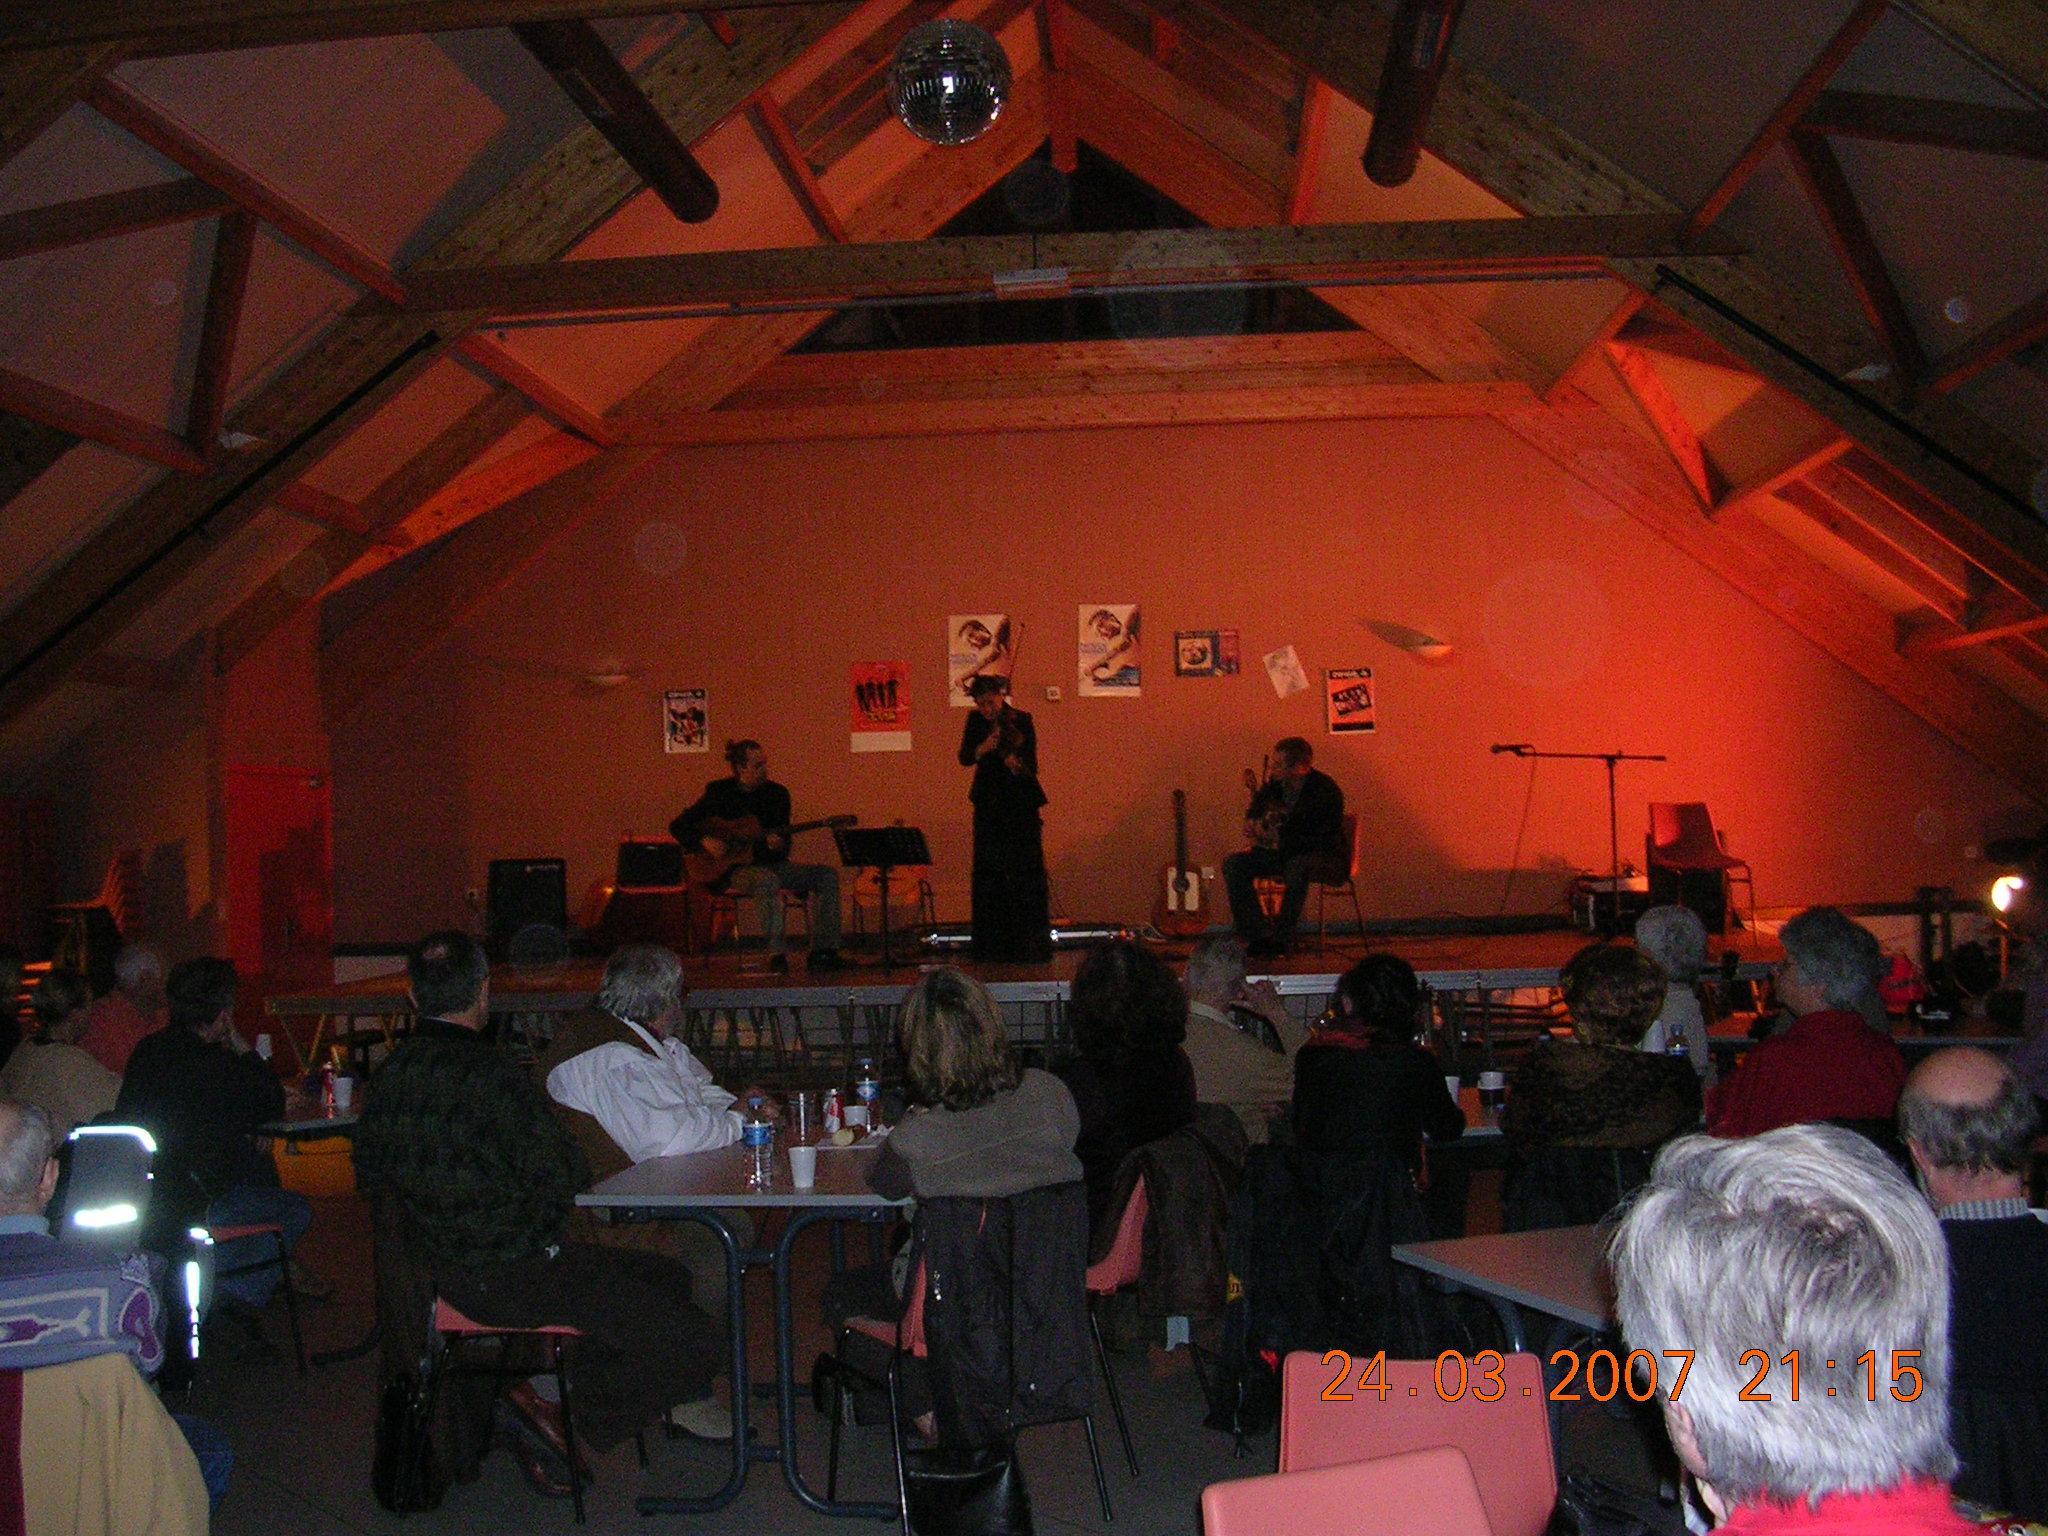 World Fest Music mars Darvault 2007